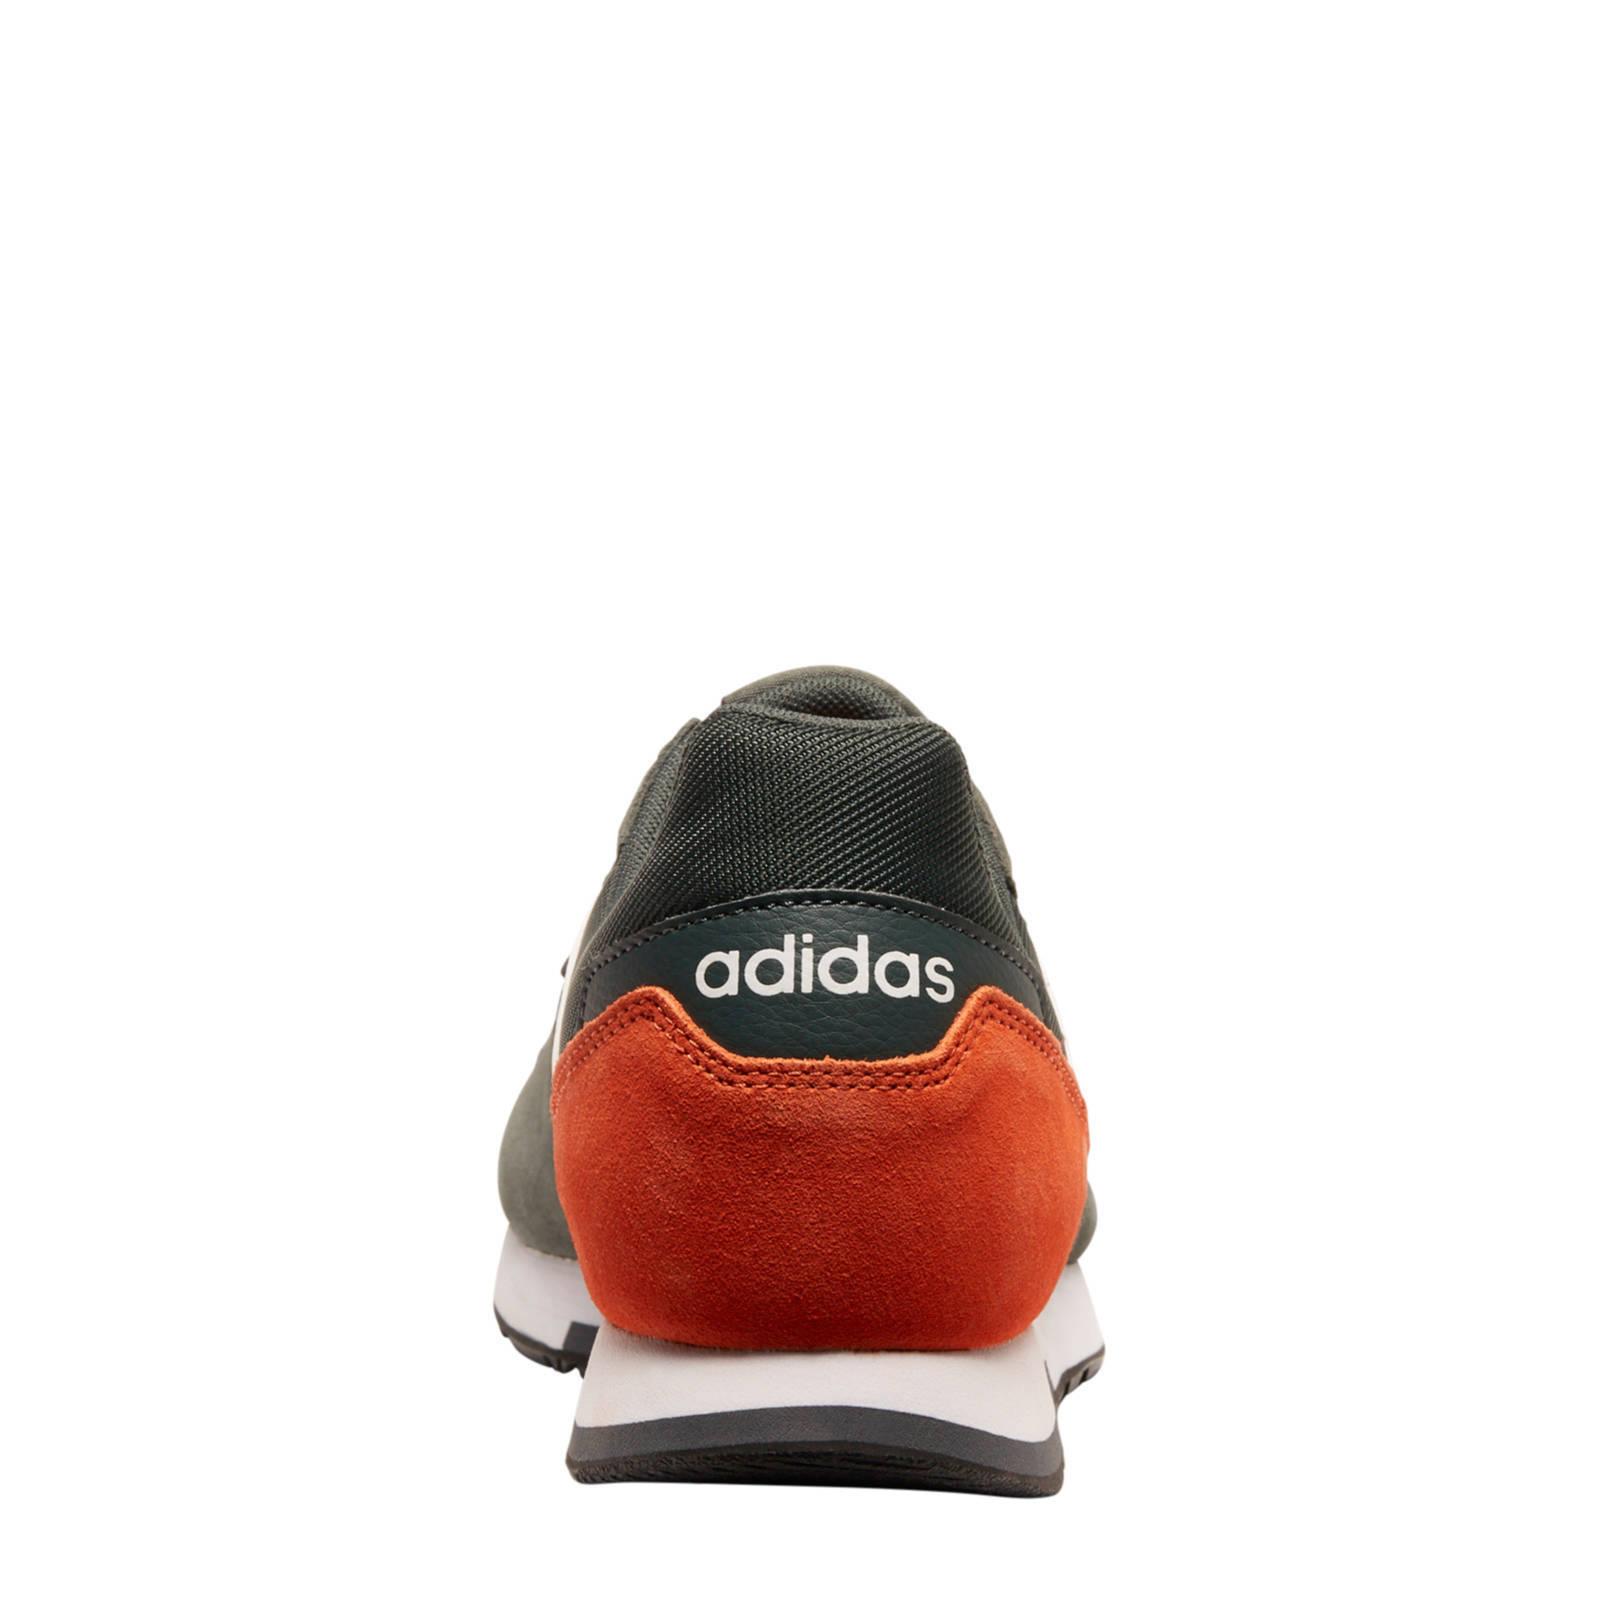 8K leren sneakers zwartoranjewit